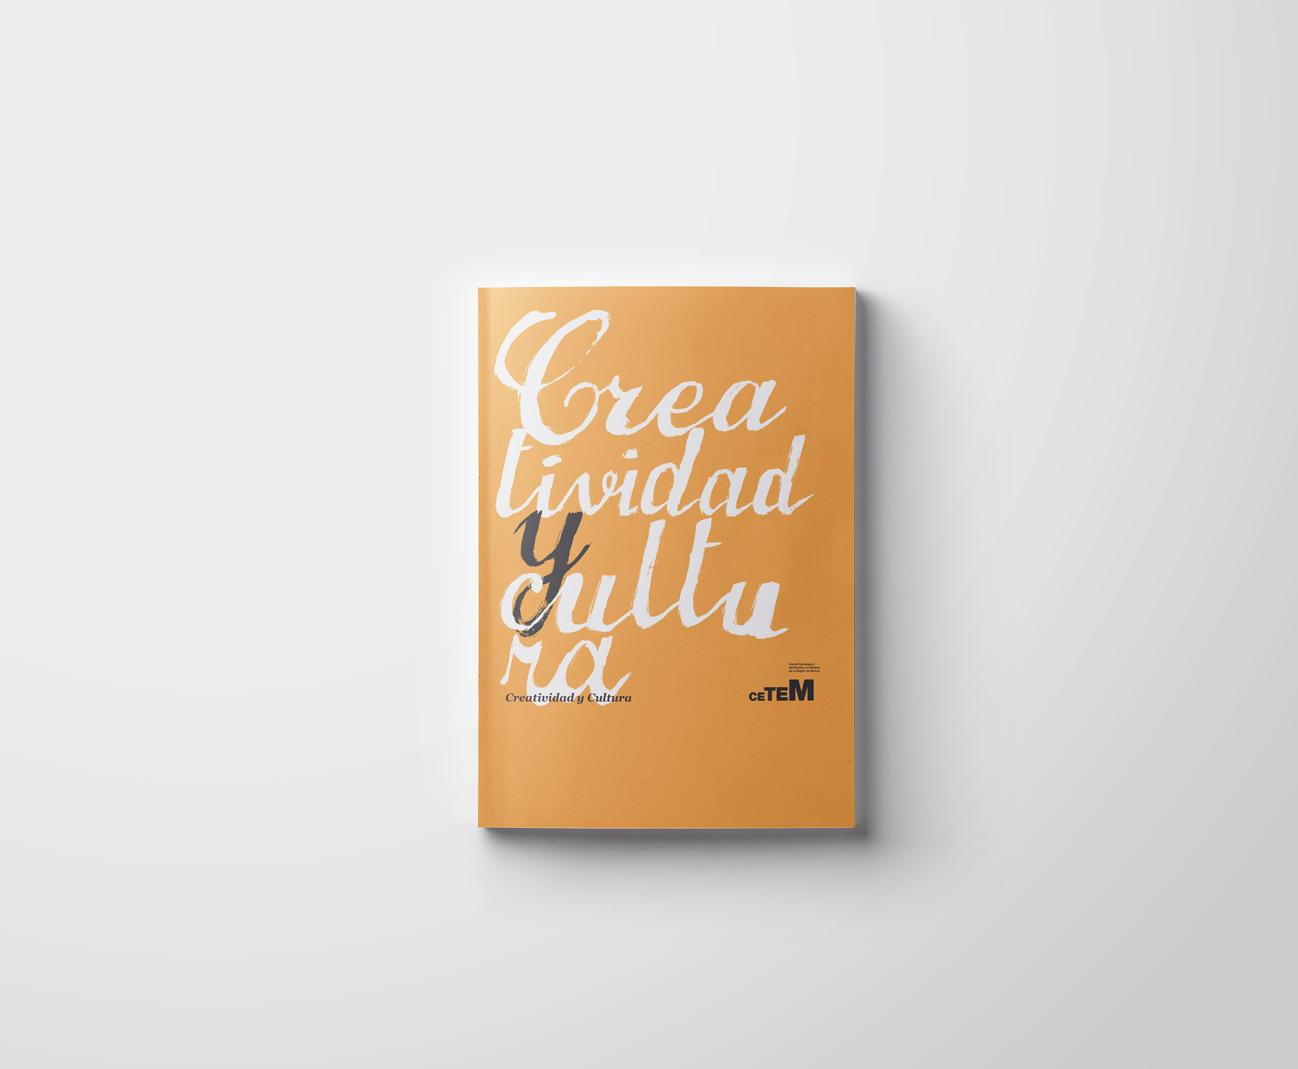 CreatividadCultura_Portada